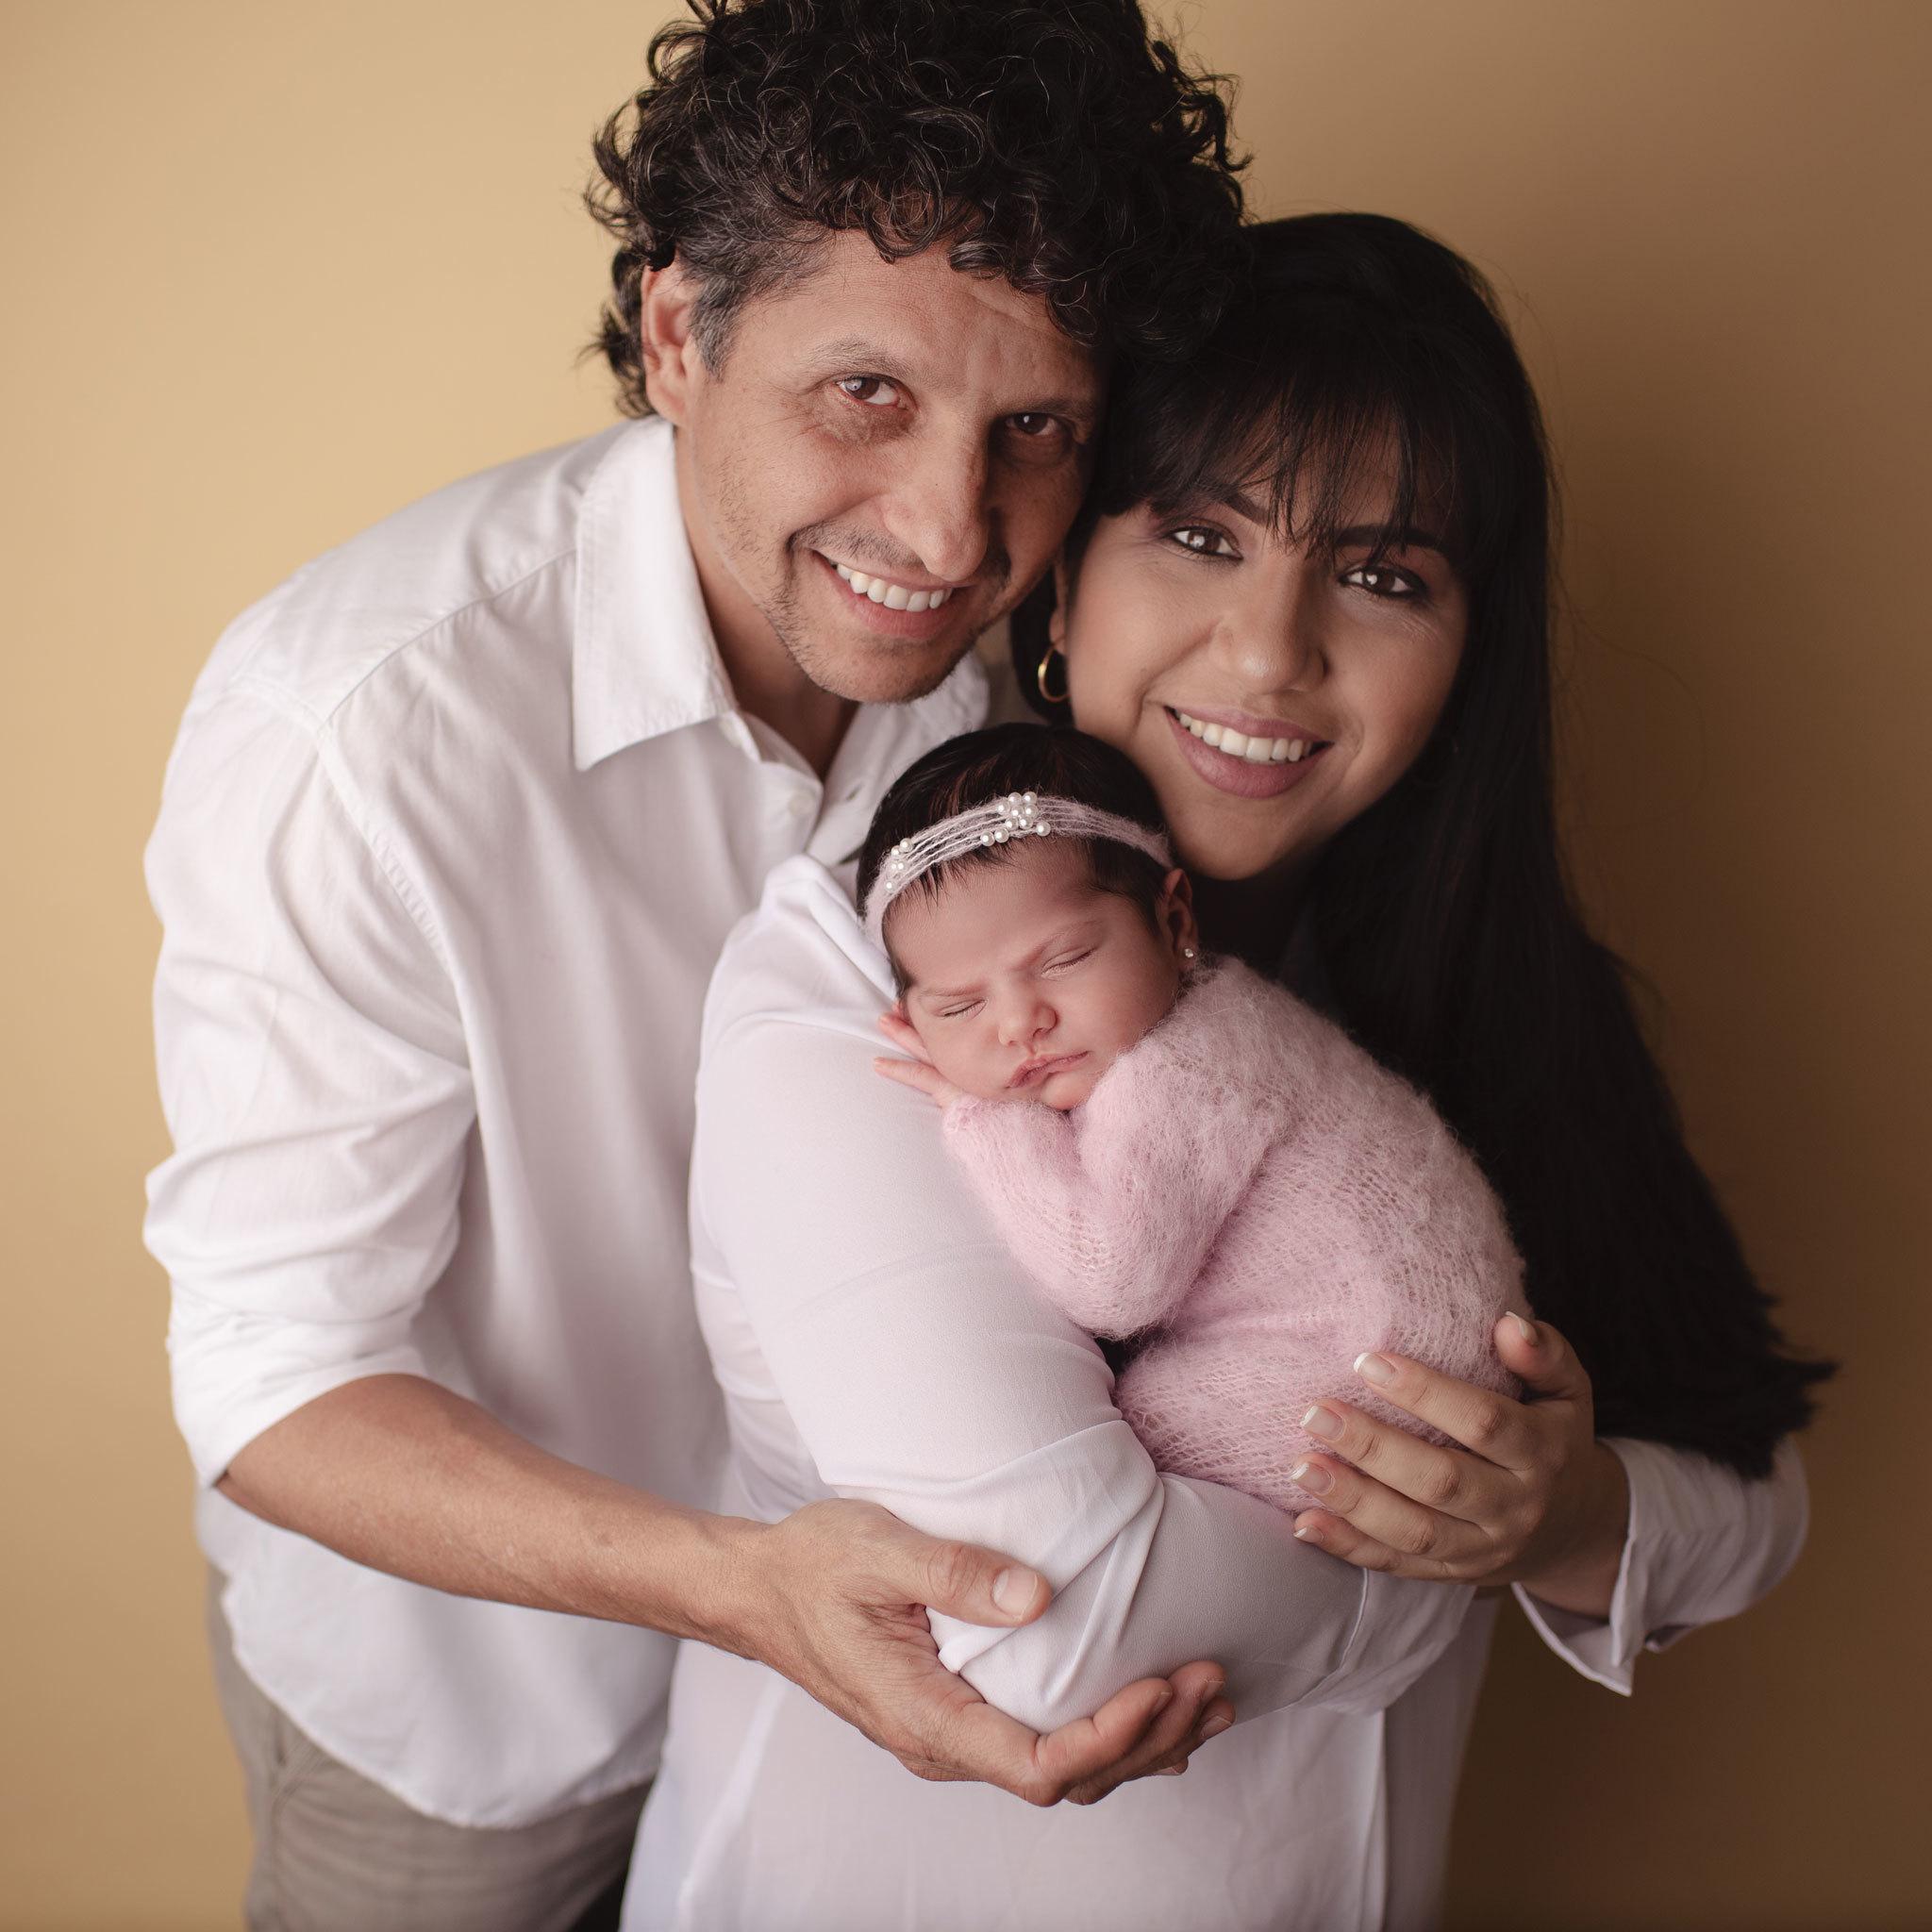 Sobre Newborn Campinas • Karina Brandão Newborn Studio • Newborn com Amor ♥